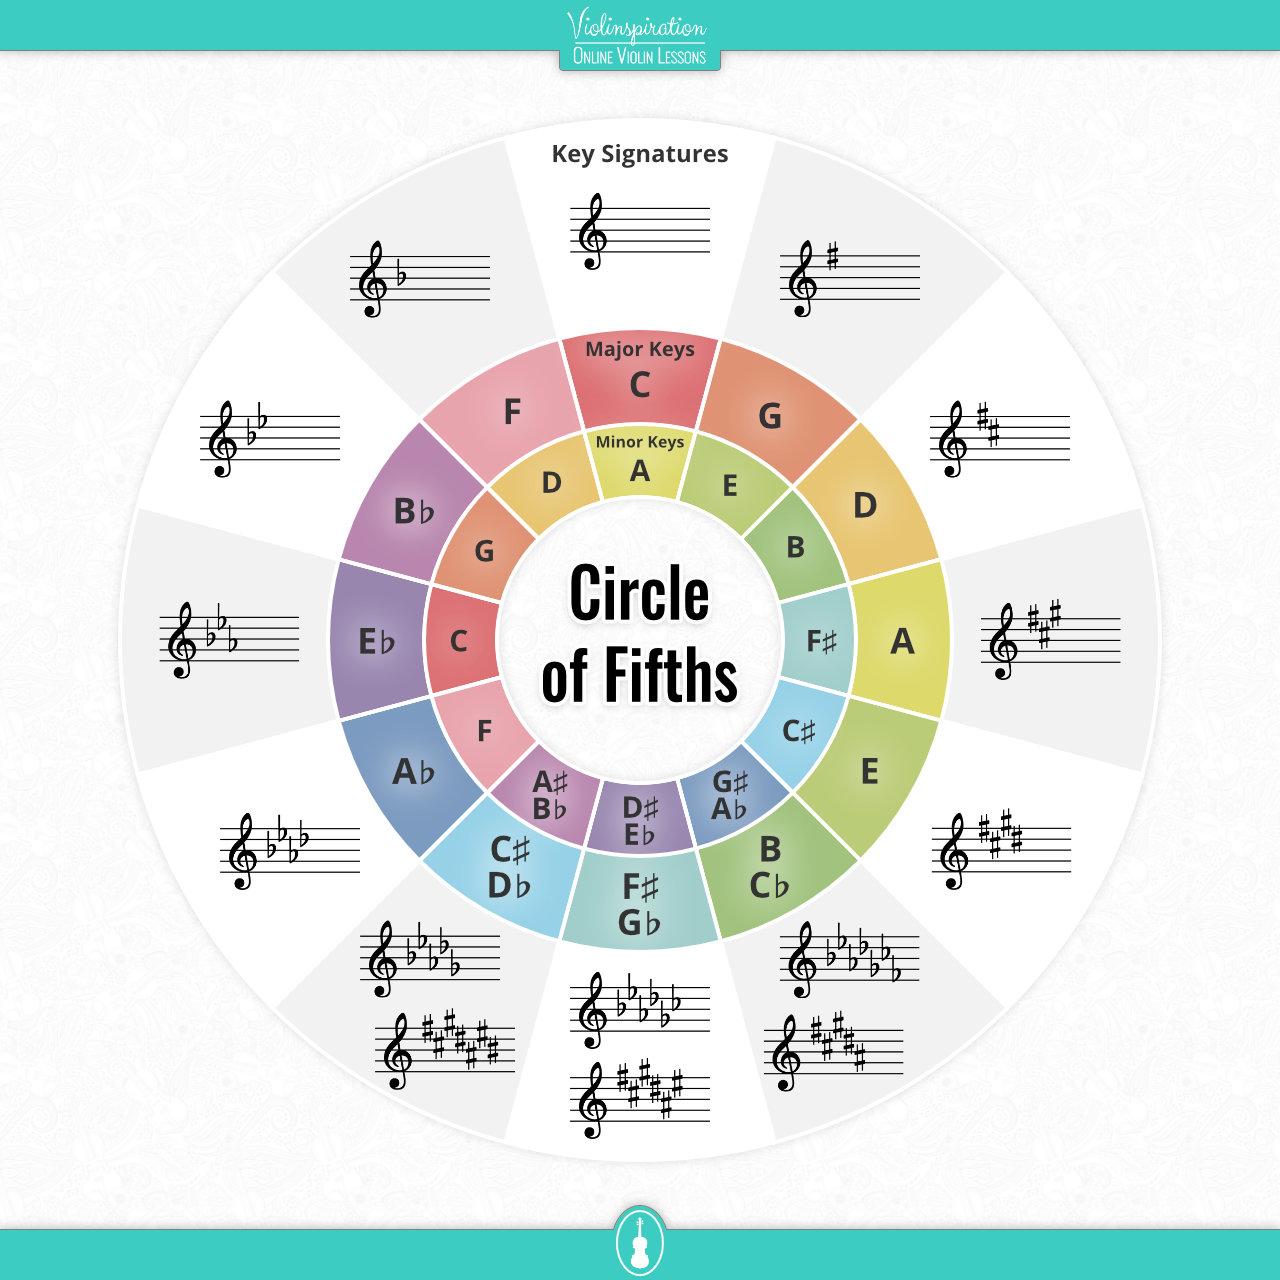 Violin Key Signatures - Circle of Fifths